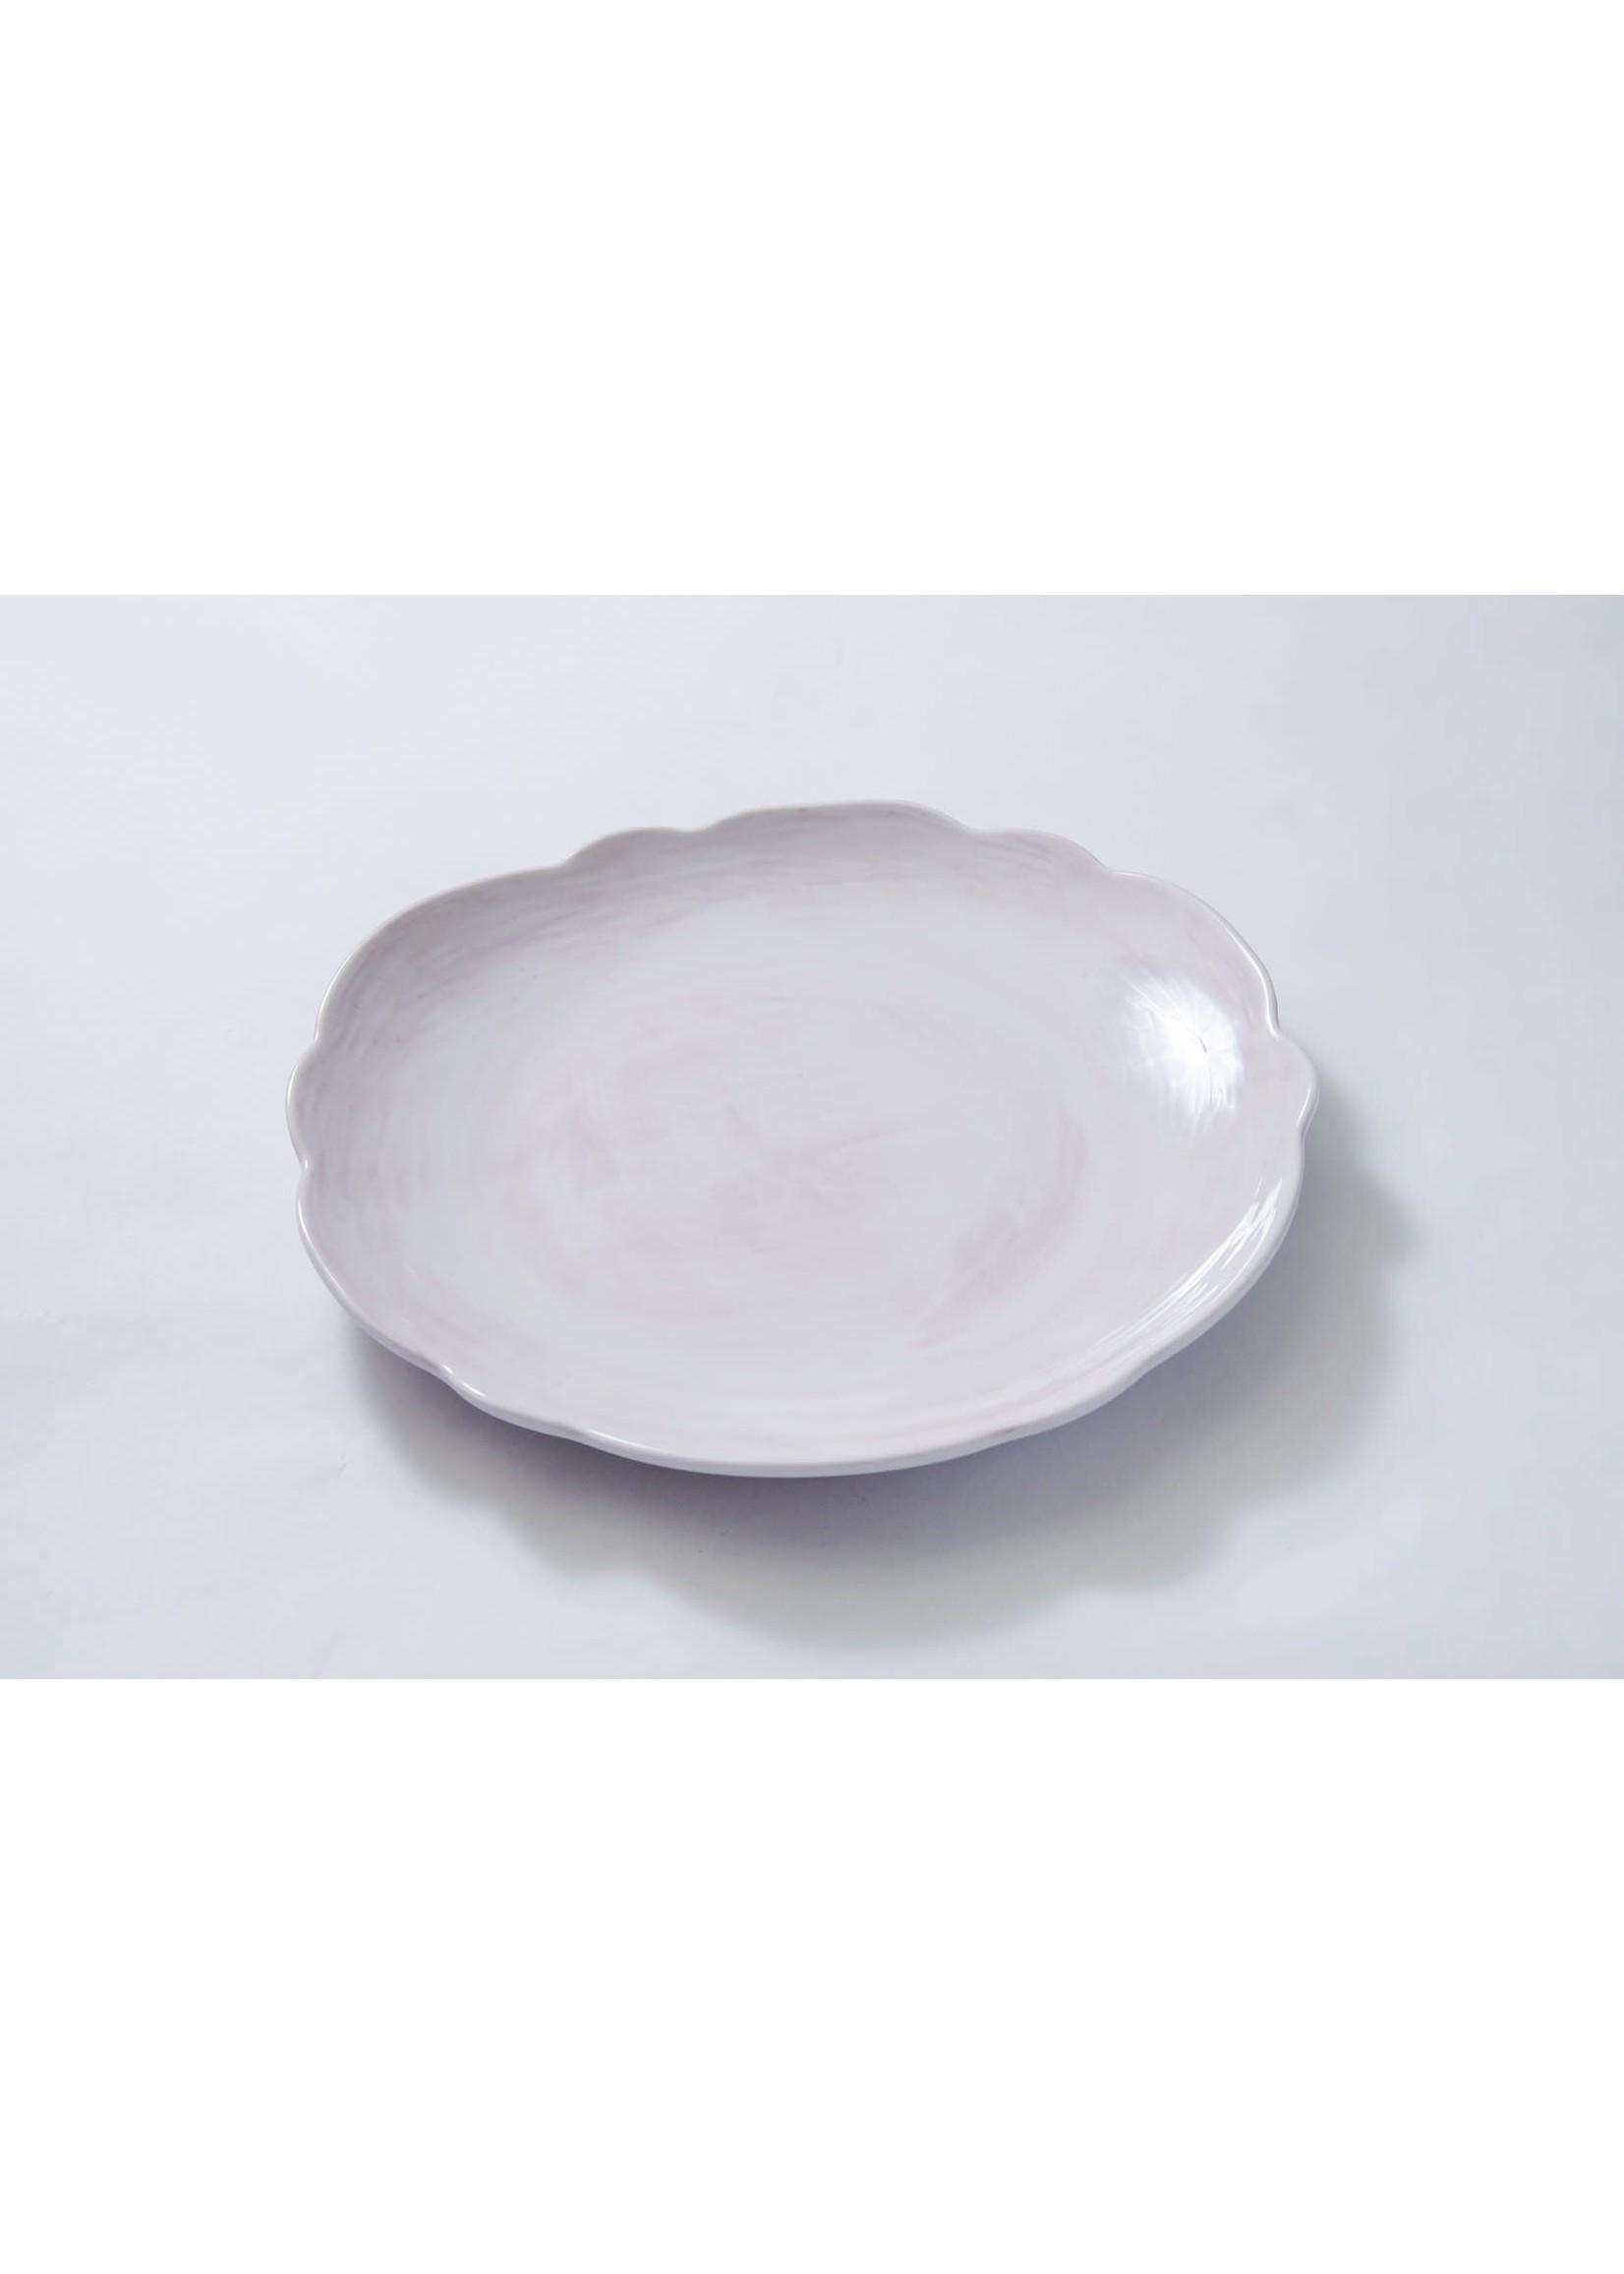 Relish Melamine - Scalloped Salad Plate - White